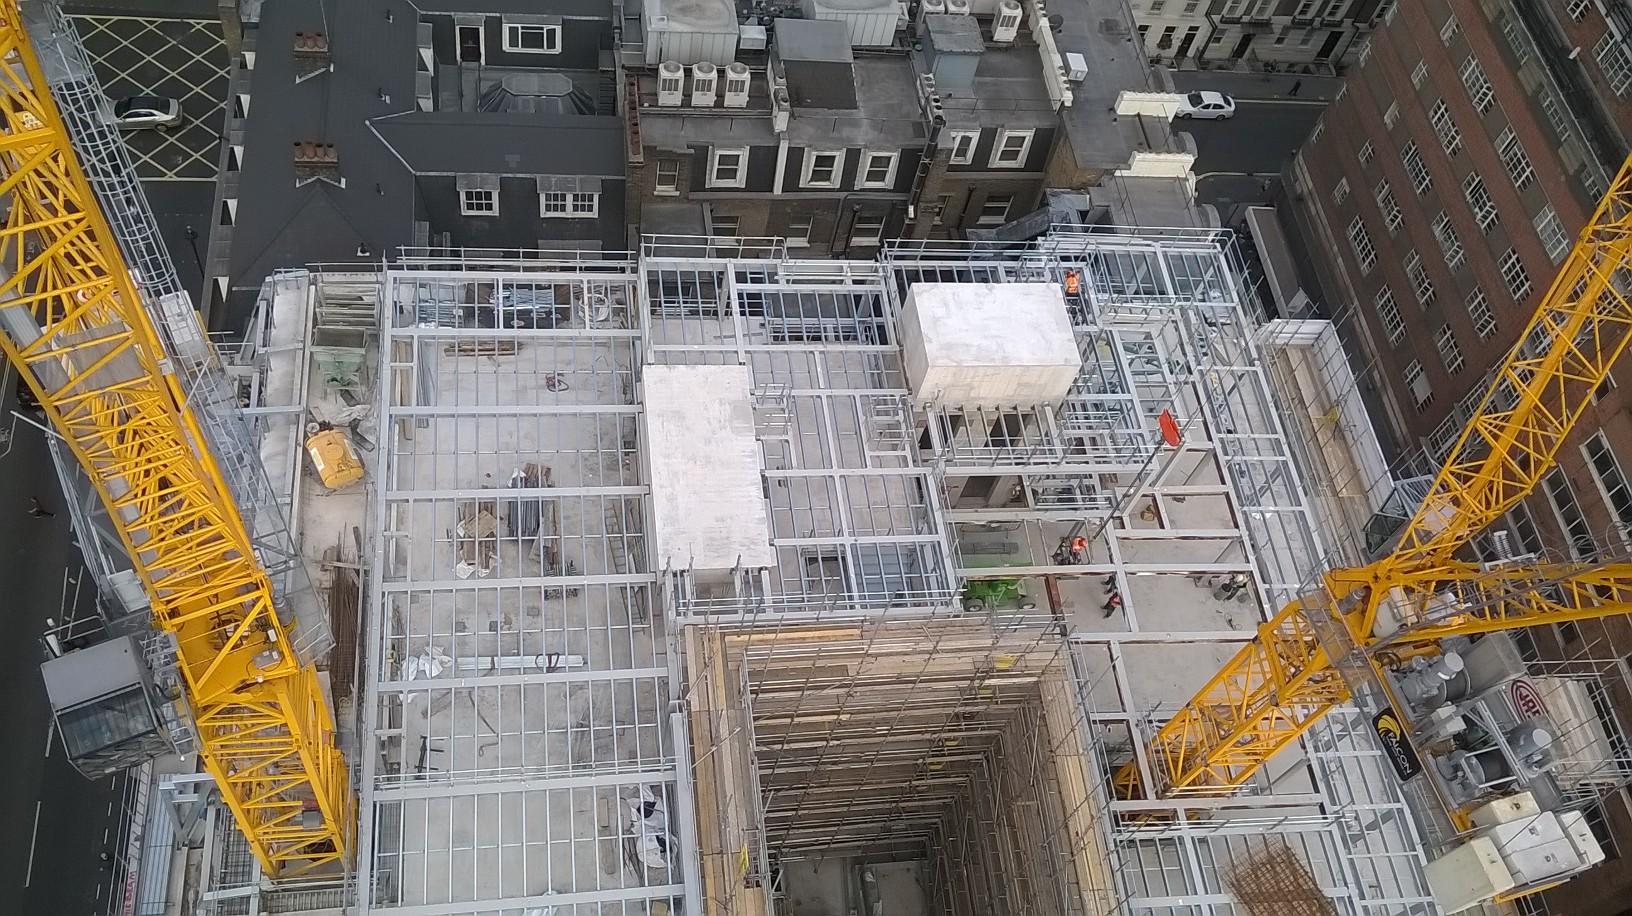 Aerial shots of seymour street (14)